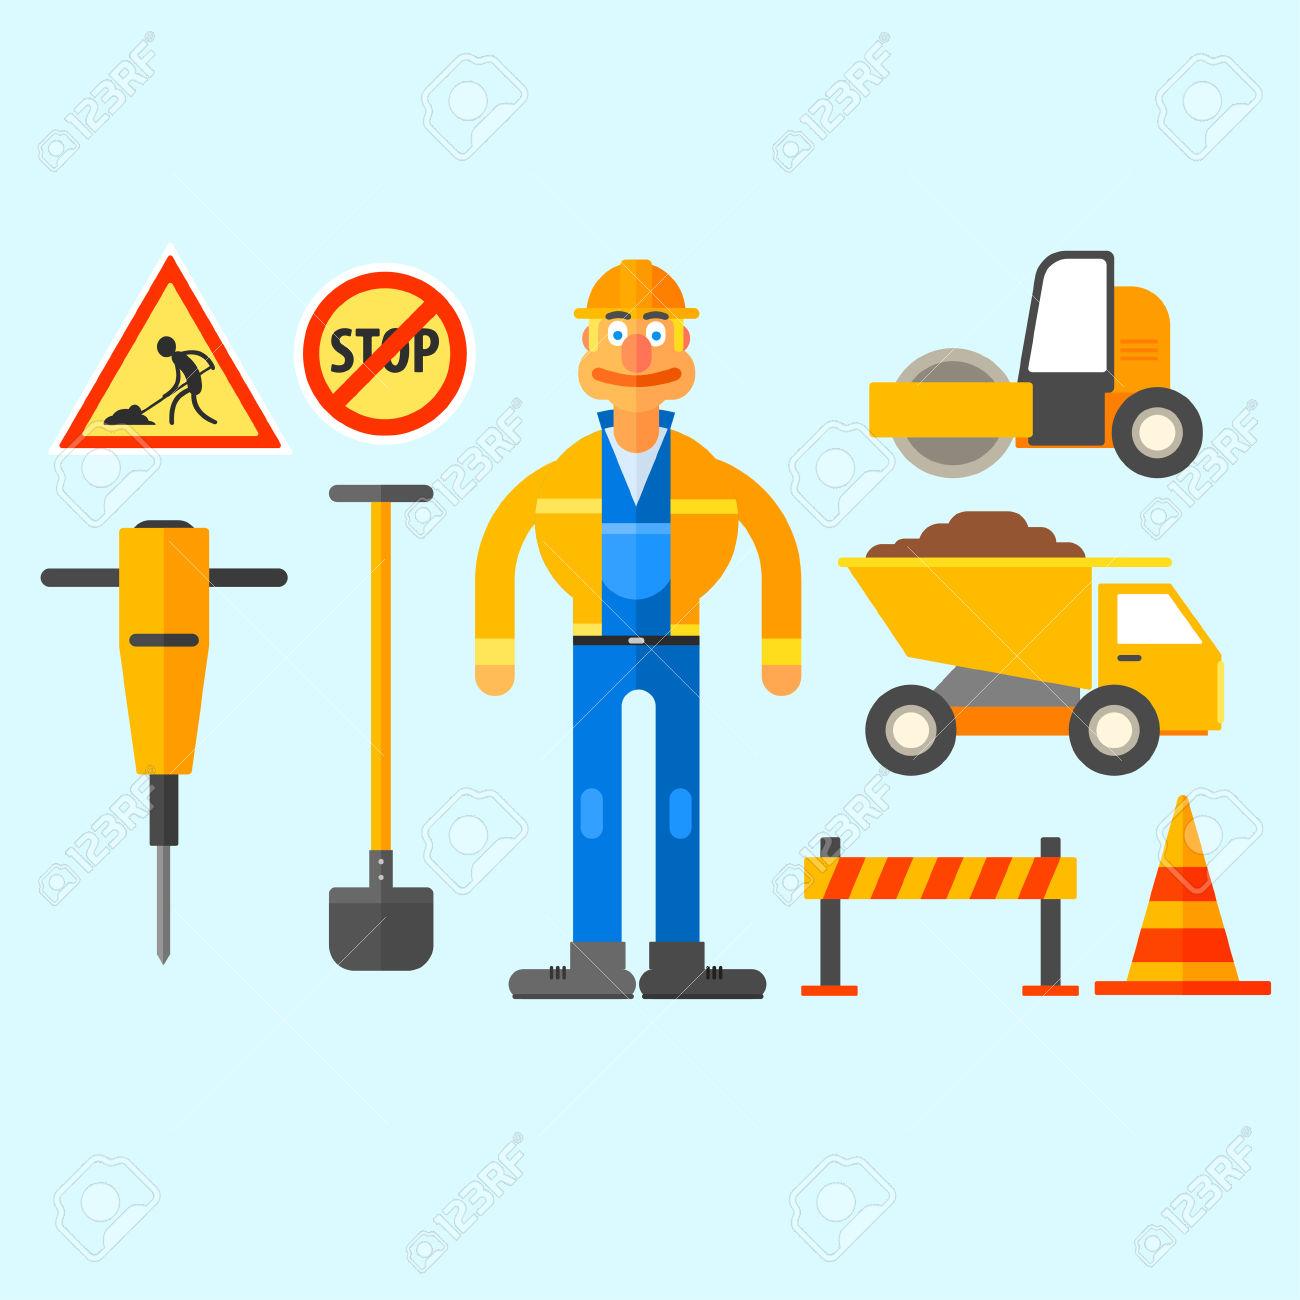 Road Repair Work, Equipment To Repair Roads And Work In The Form.